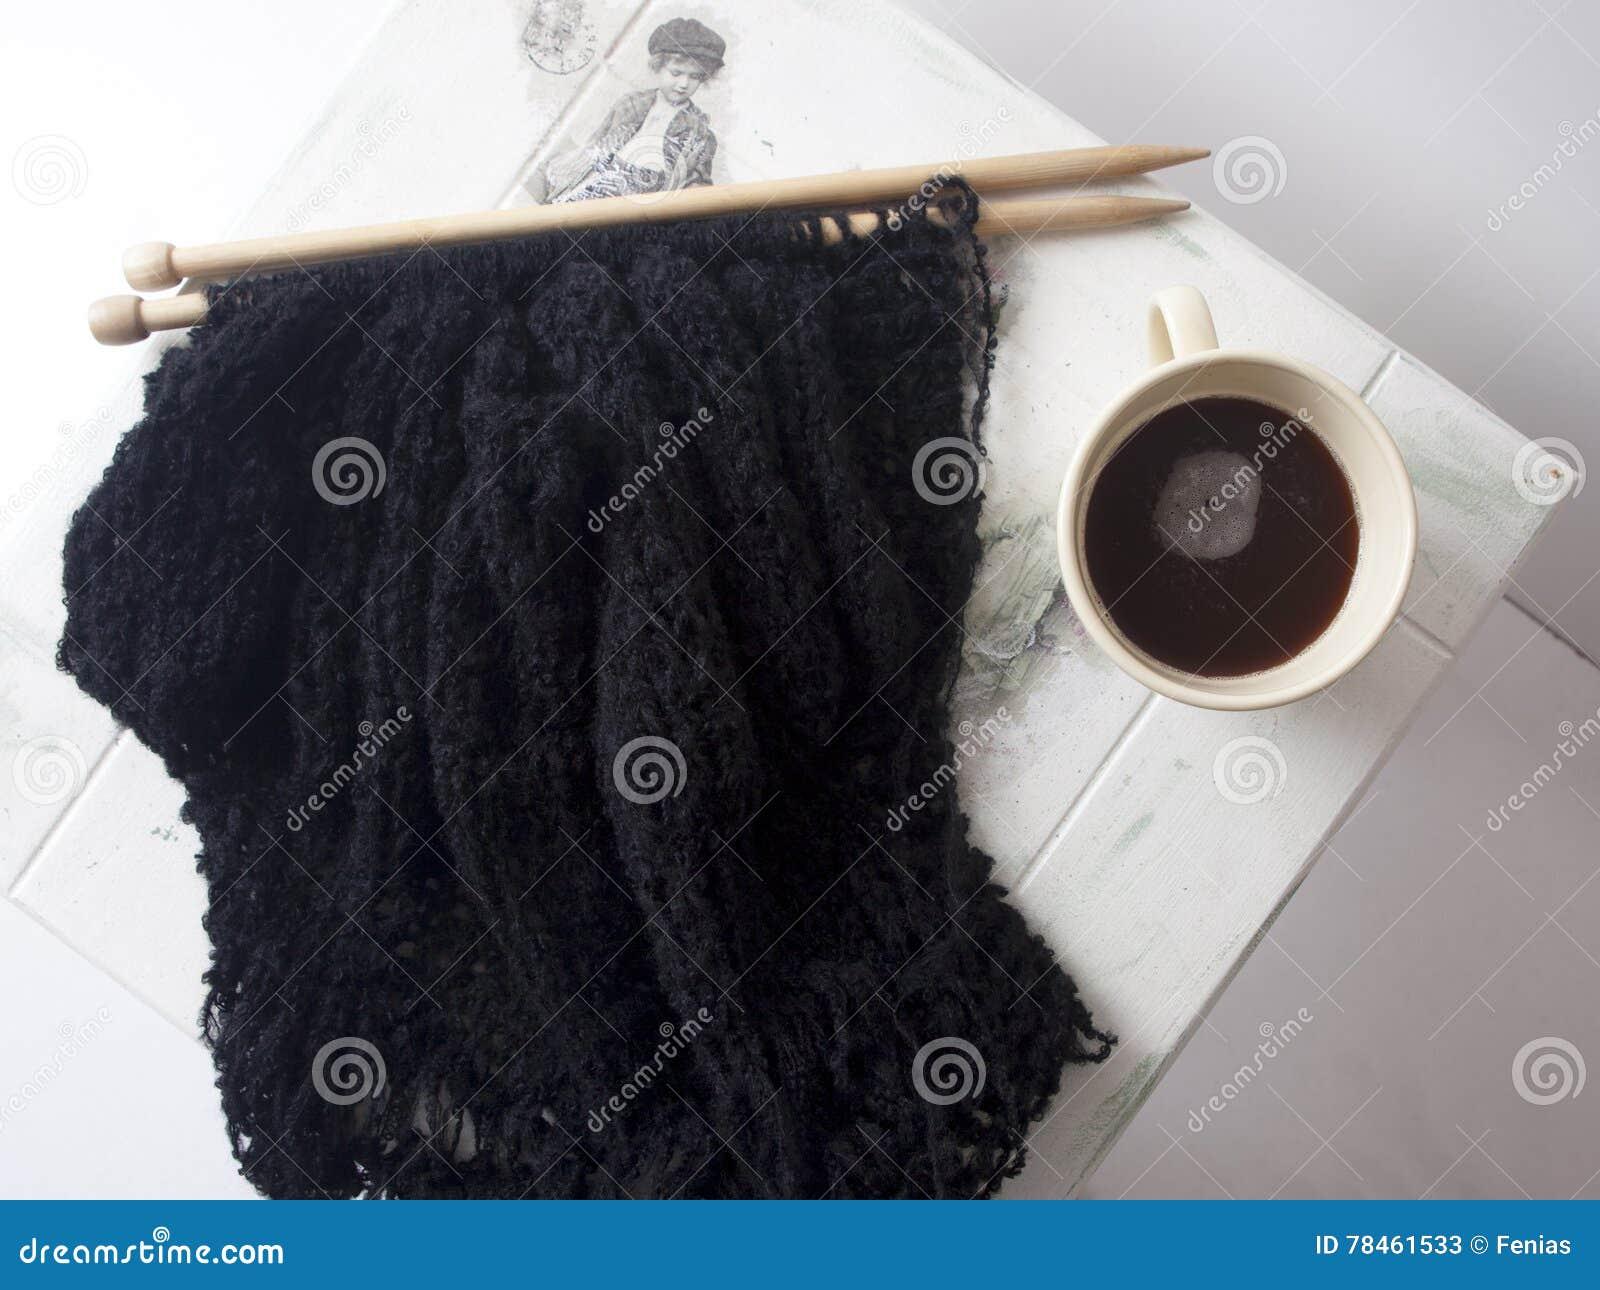 c911402a84f6 Πλεκτό μαύρο πουλόβερ στοκ εικόνα. εικόνα από εξαρτημάτων - 78461533